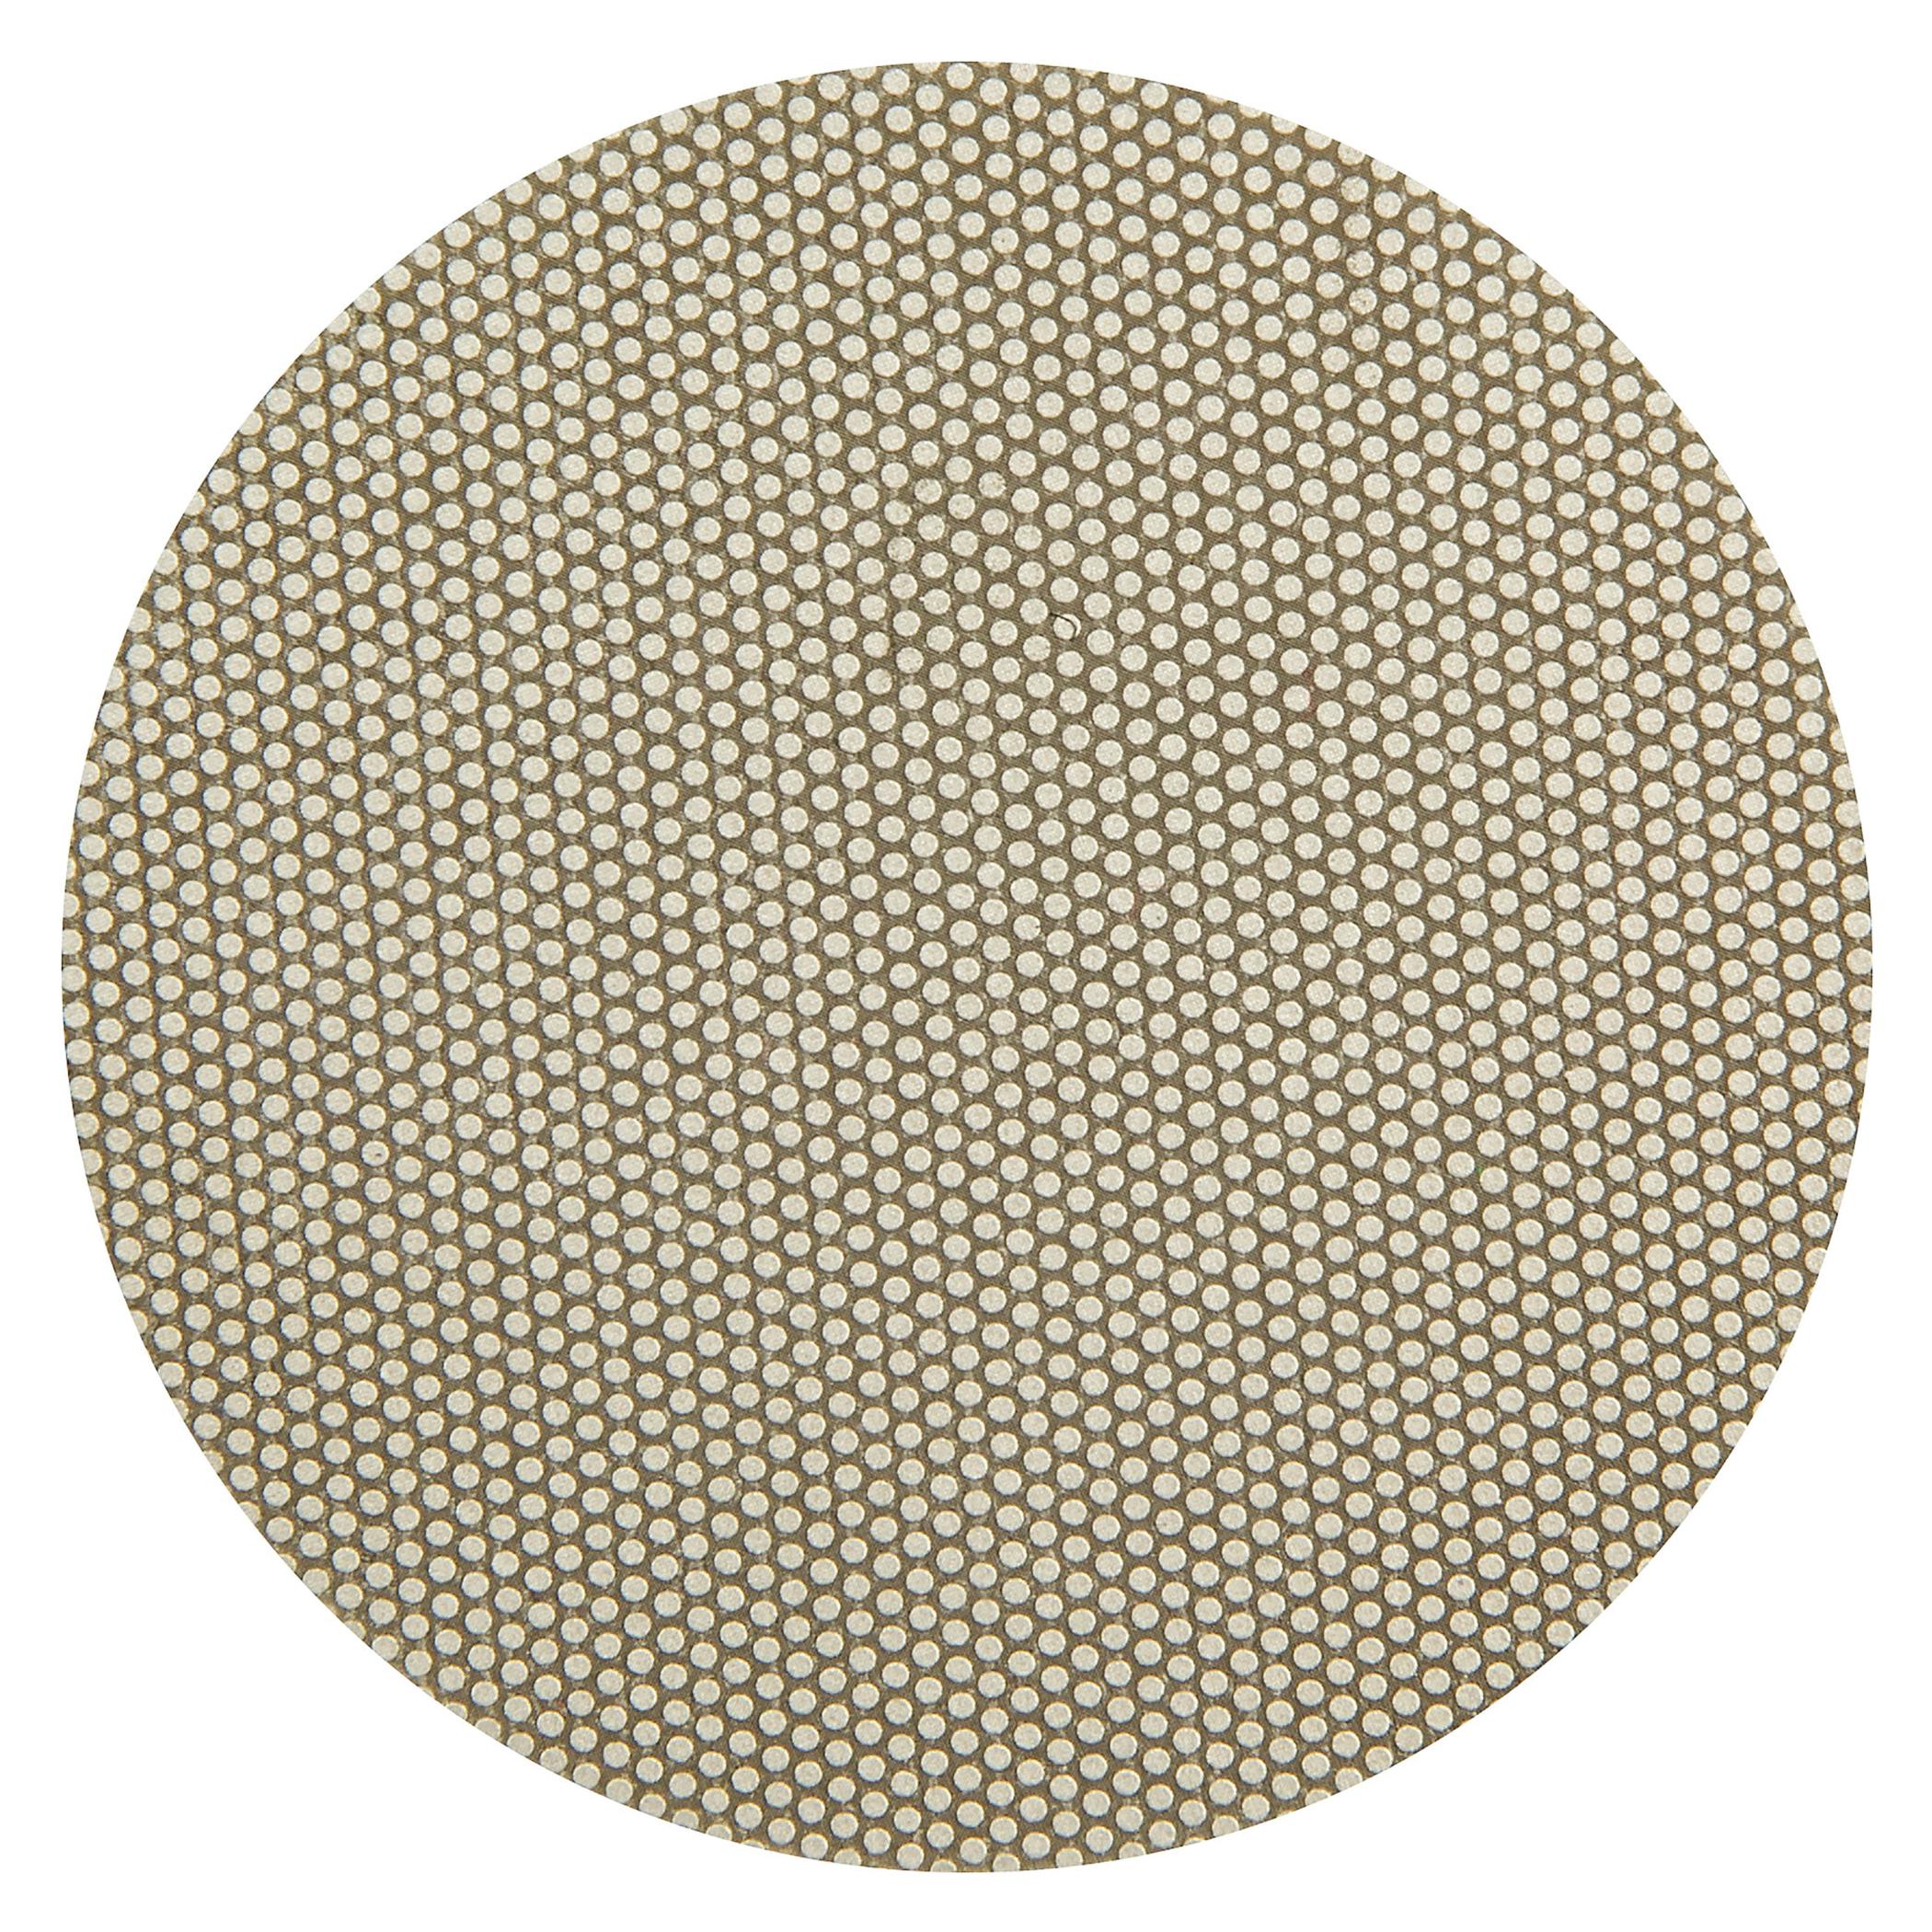 Norton® 66260307012 D71S Flexible Coated Abrasive Disc, 2 in Dia, 800 Grit, Super Fine Grade, Diamond Abrasive